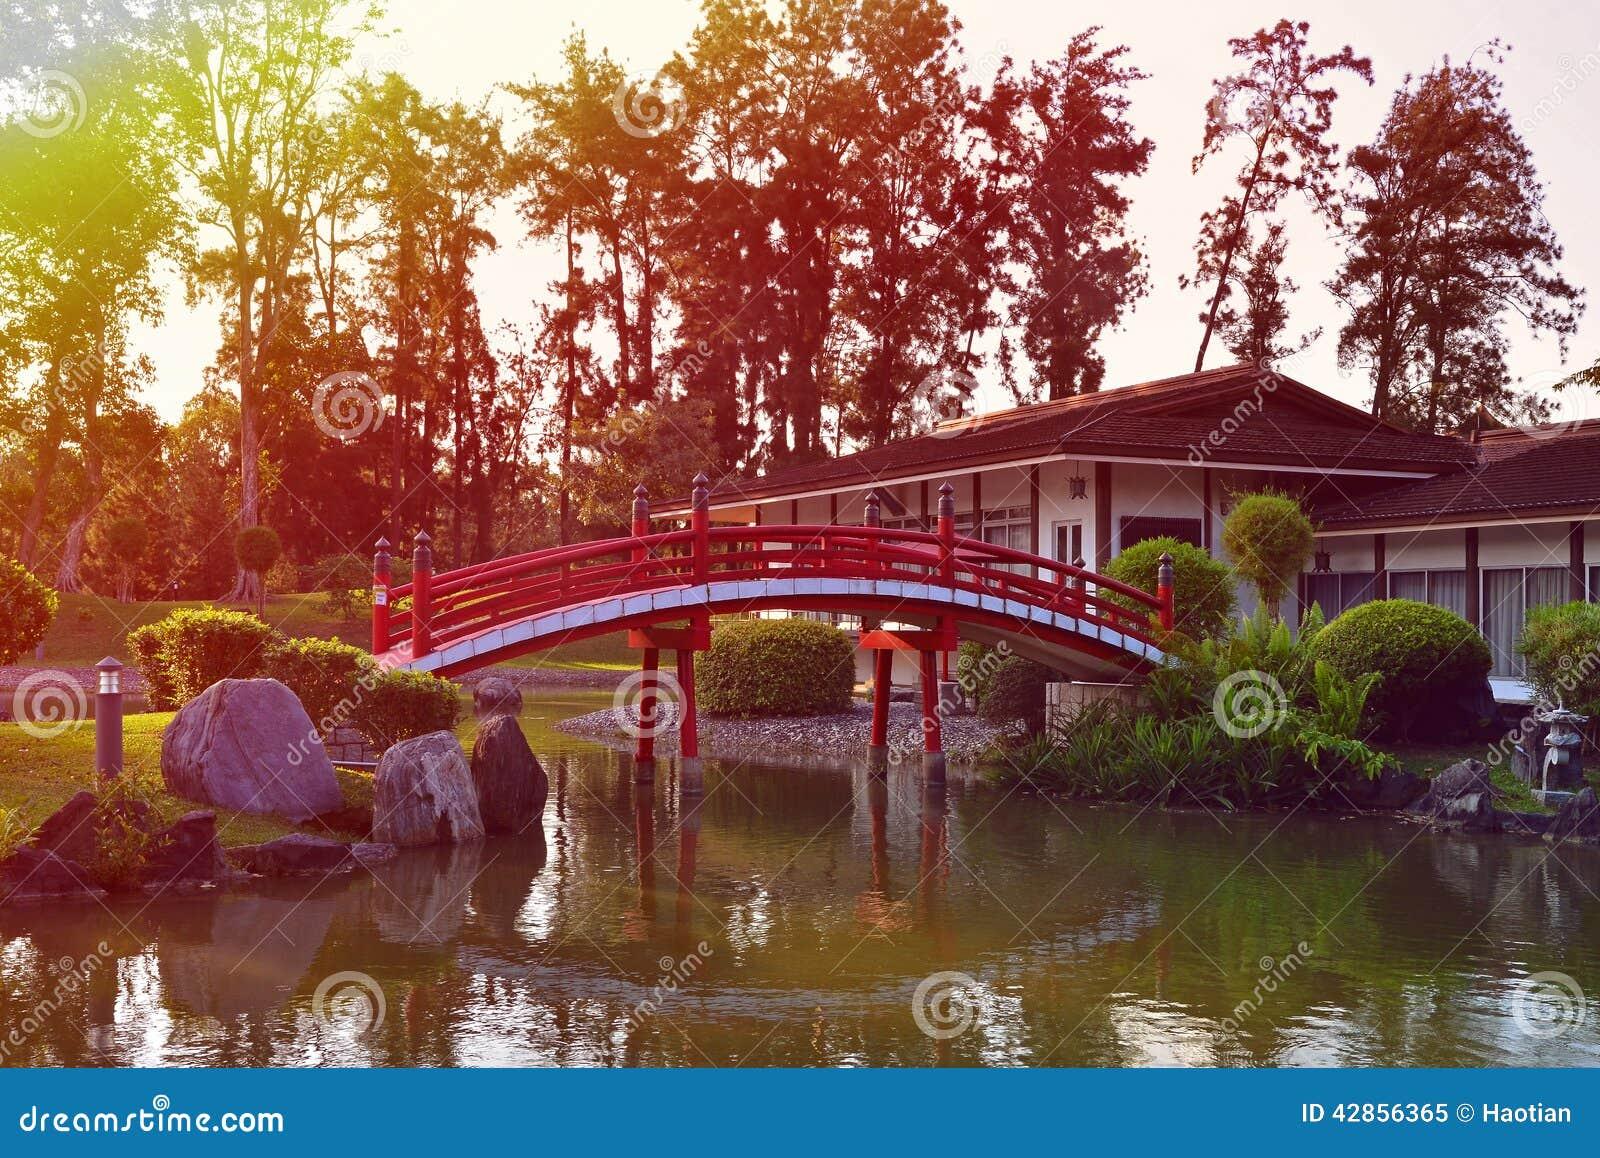 Exceptional Singapore Japanese Garden